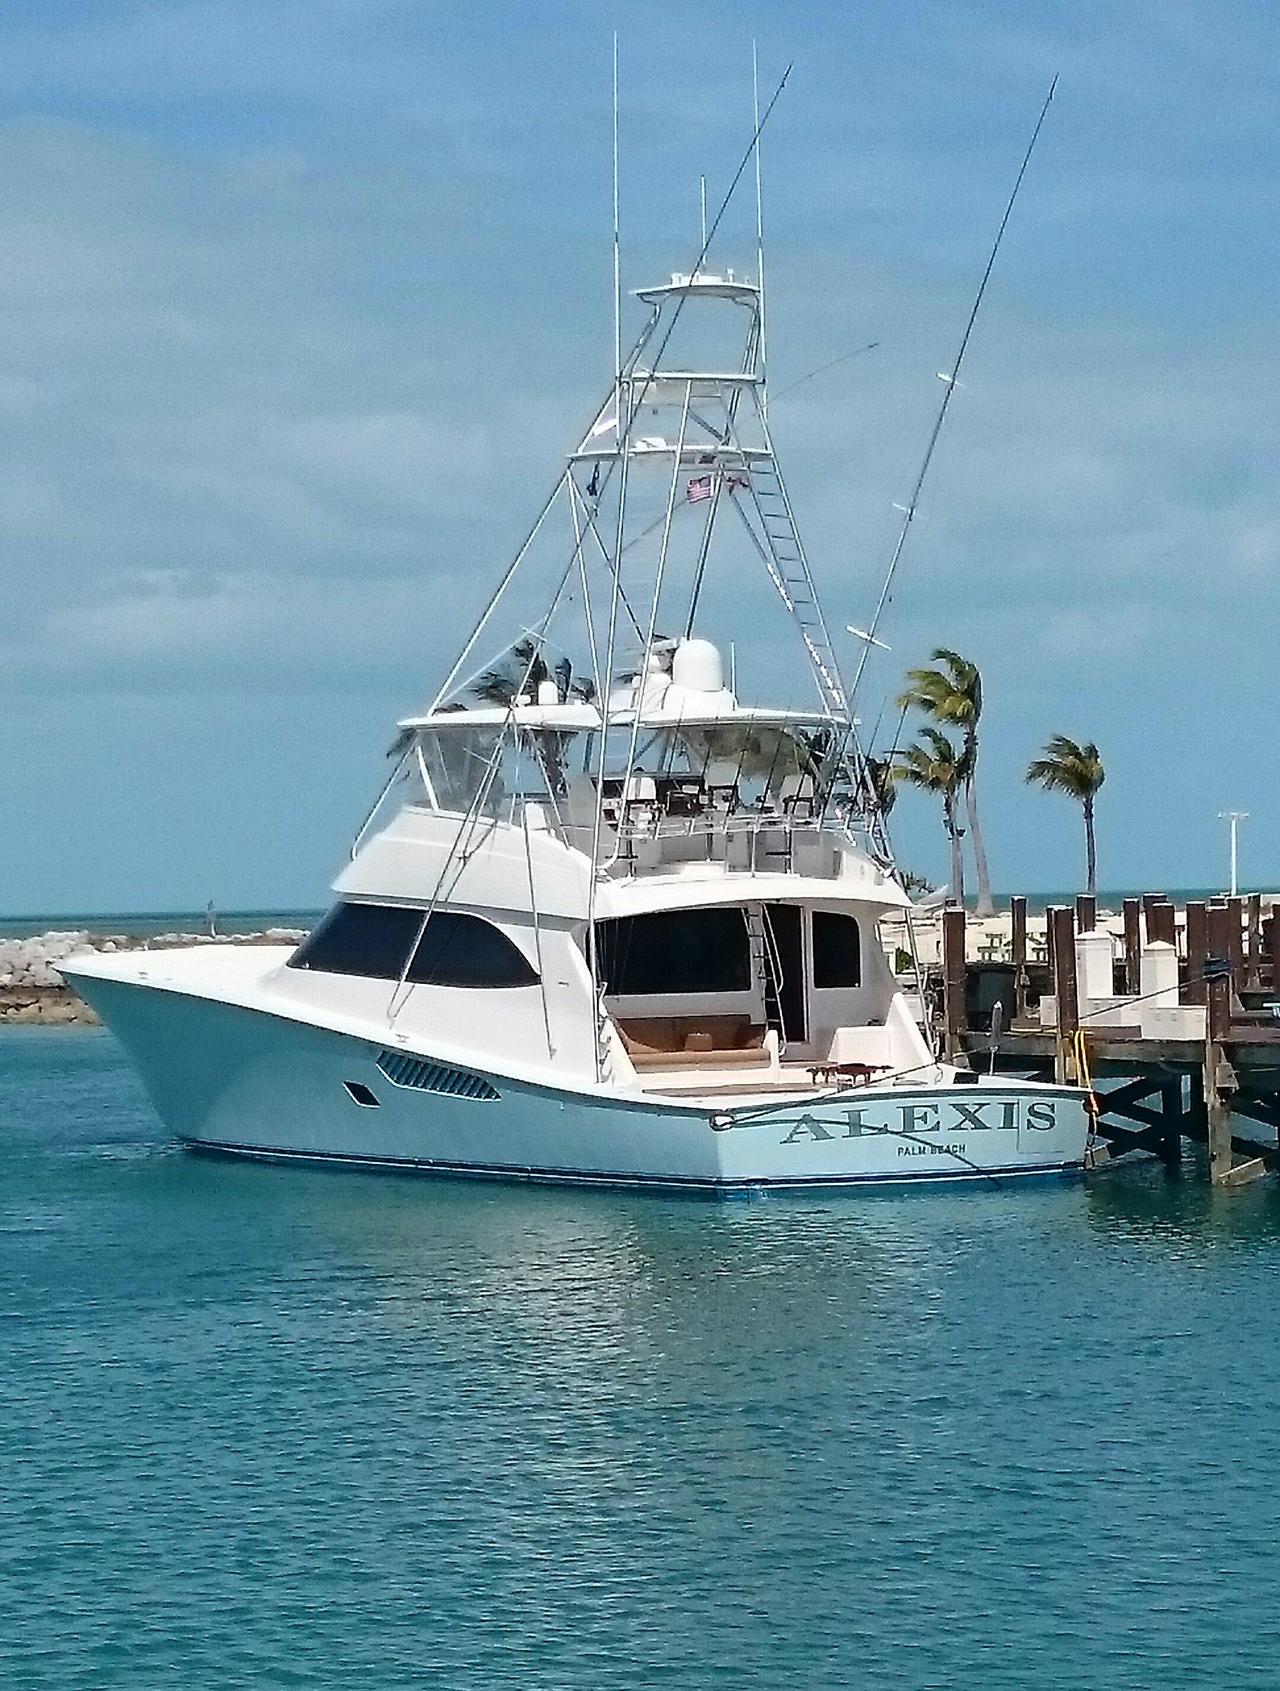 2010 used viking yachts 82 convertible sports fishing boat for Viking fishing boat